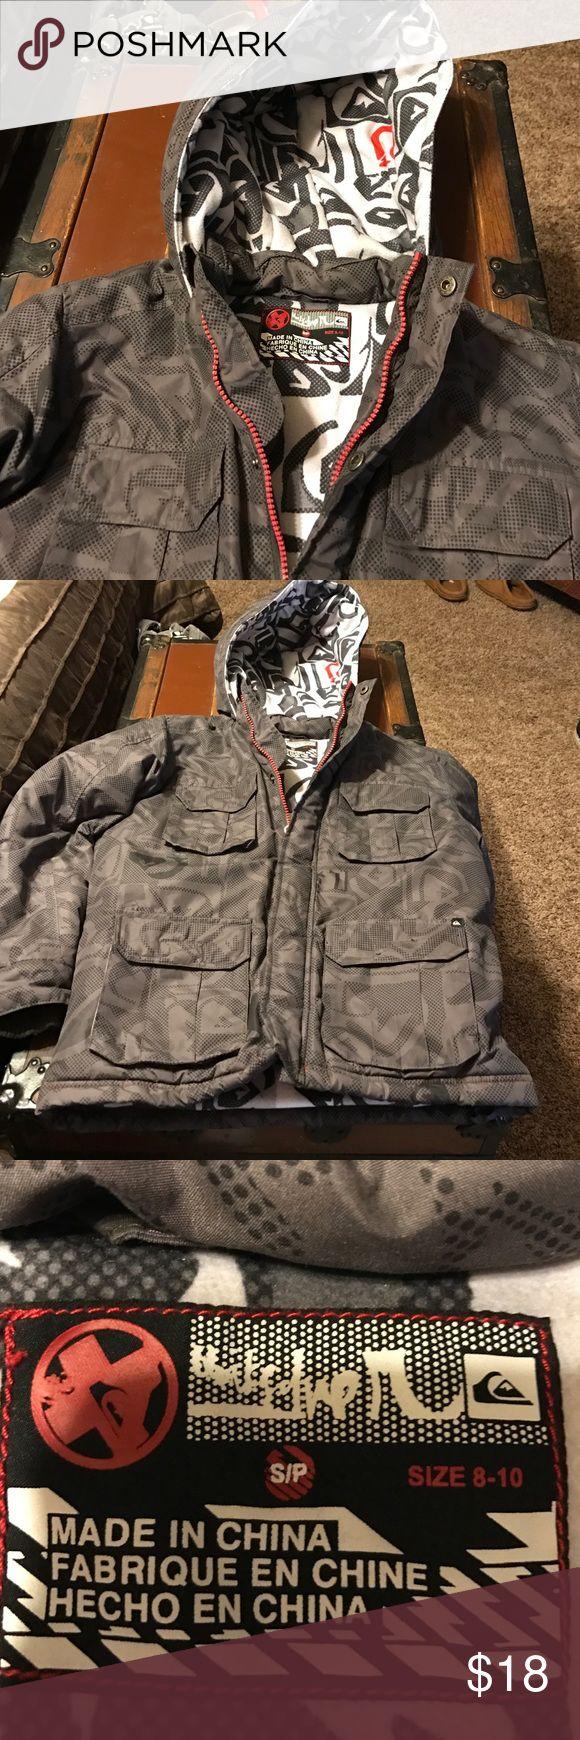 Boys Ski Jacket Quiksilver Heavy Ski/Snow jacket. Excellent condition. Quiksilver Jackets & Coats Puffers